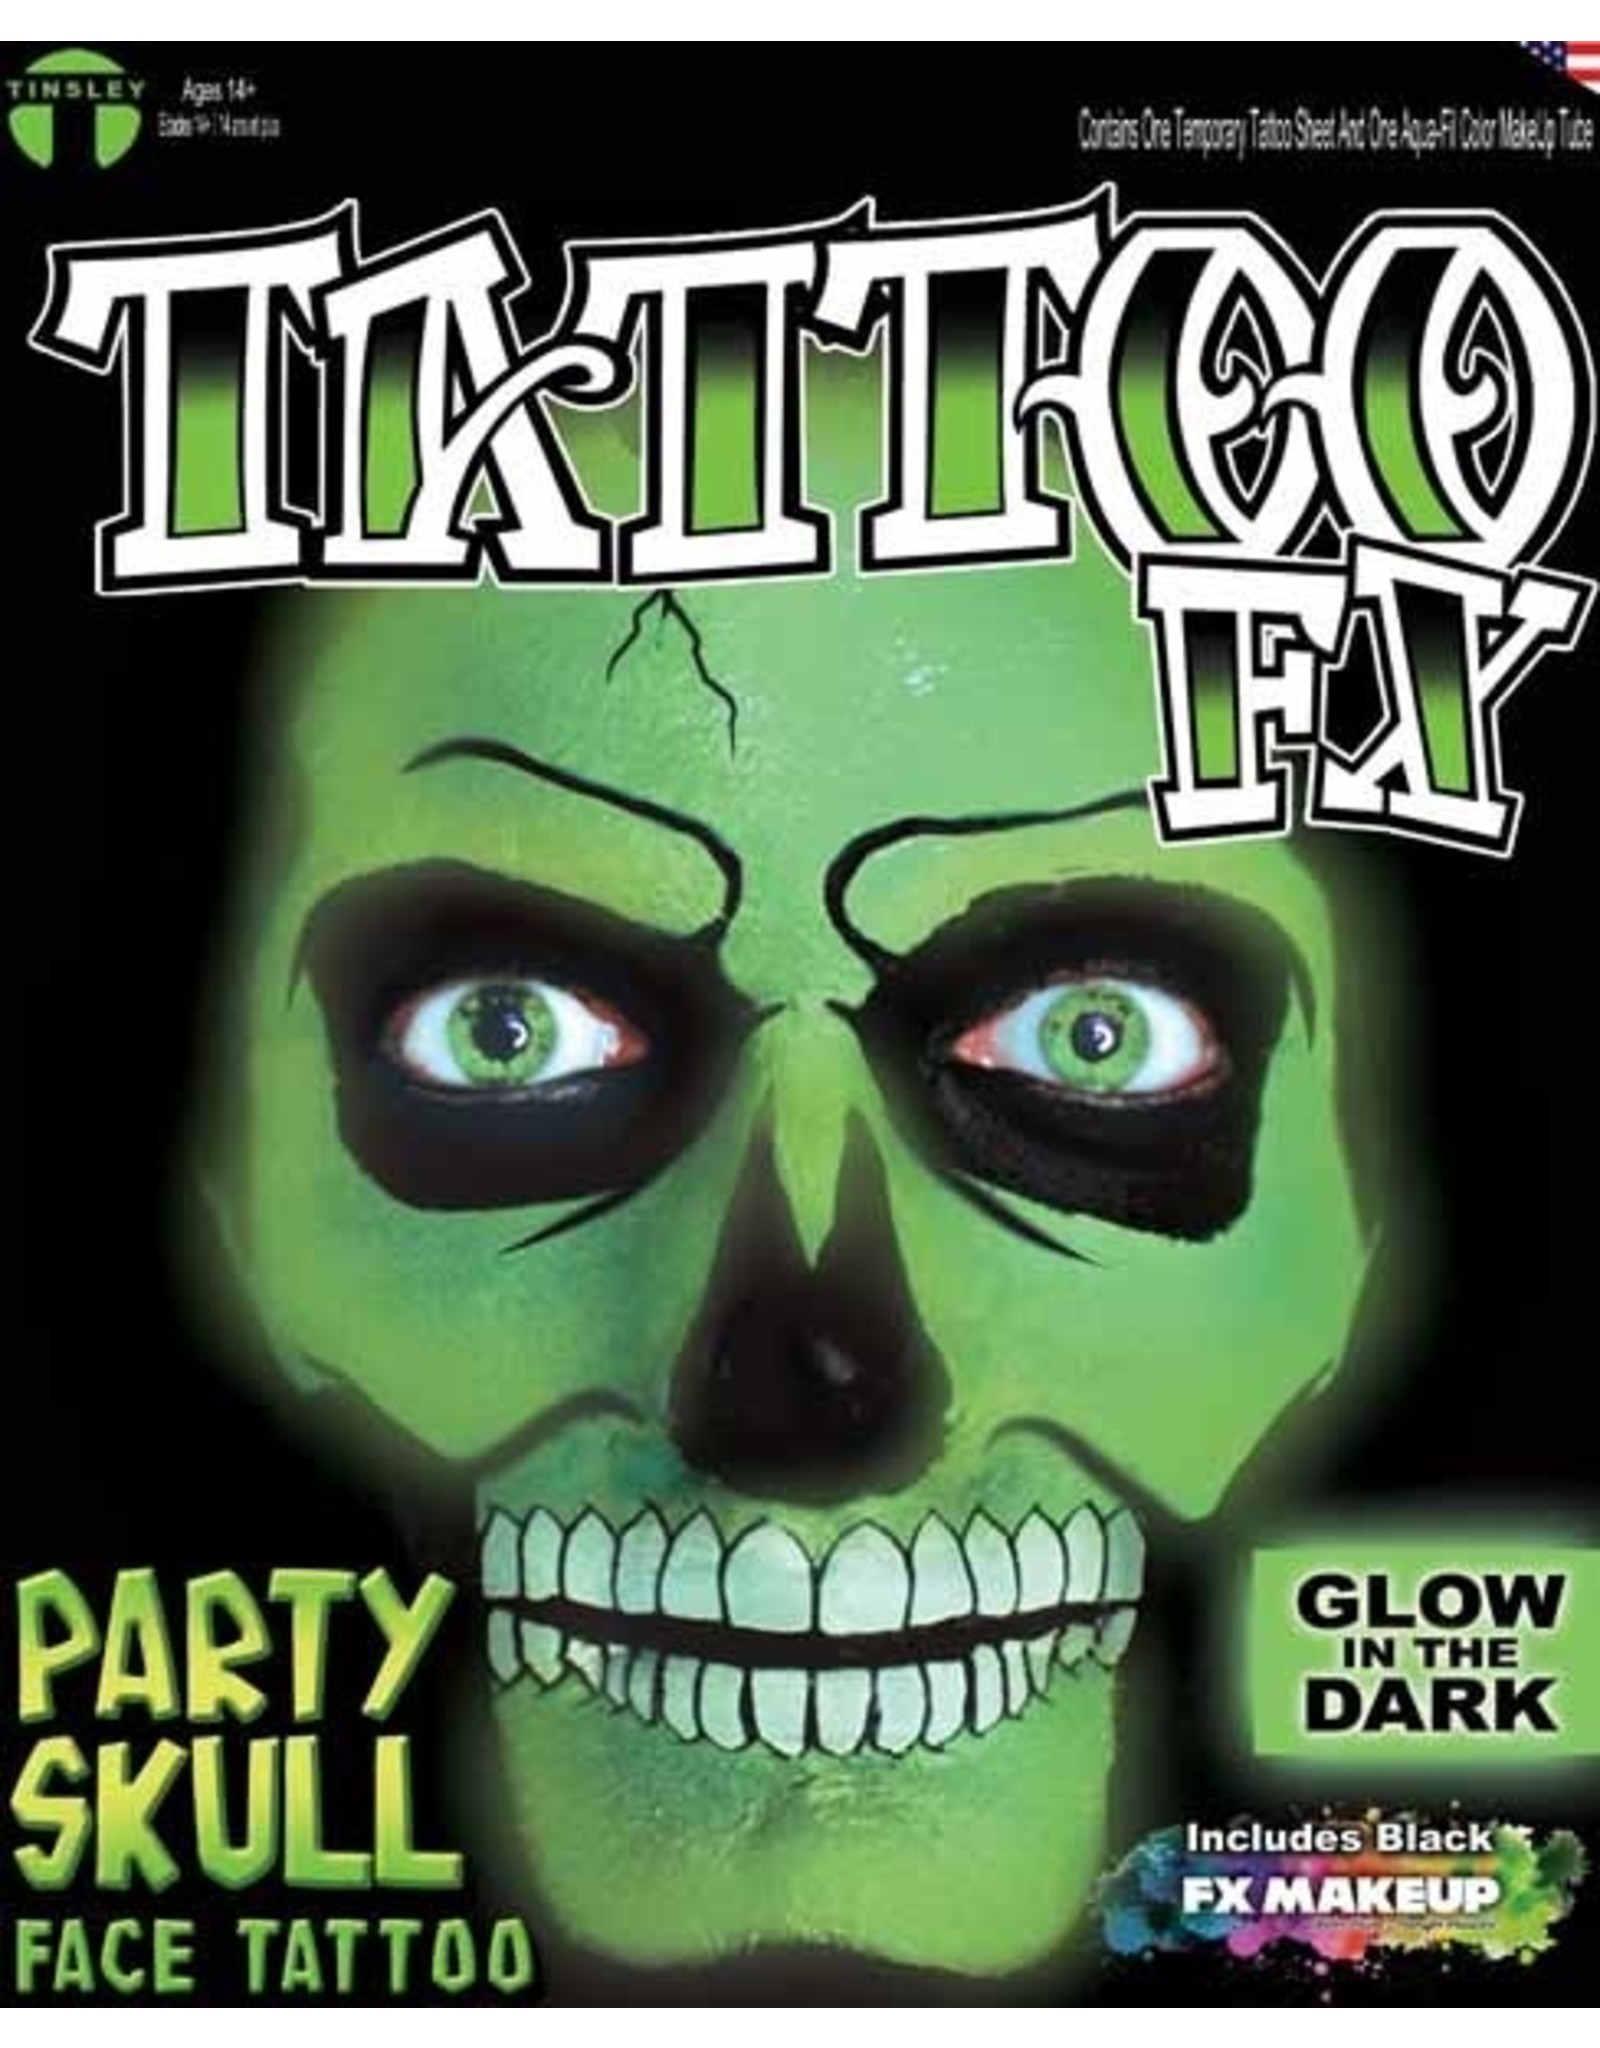 Tinsley Transfers Glow in Dark Skull Makeup Tattoo